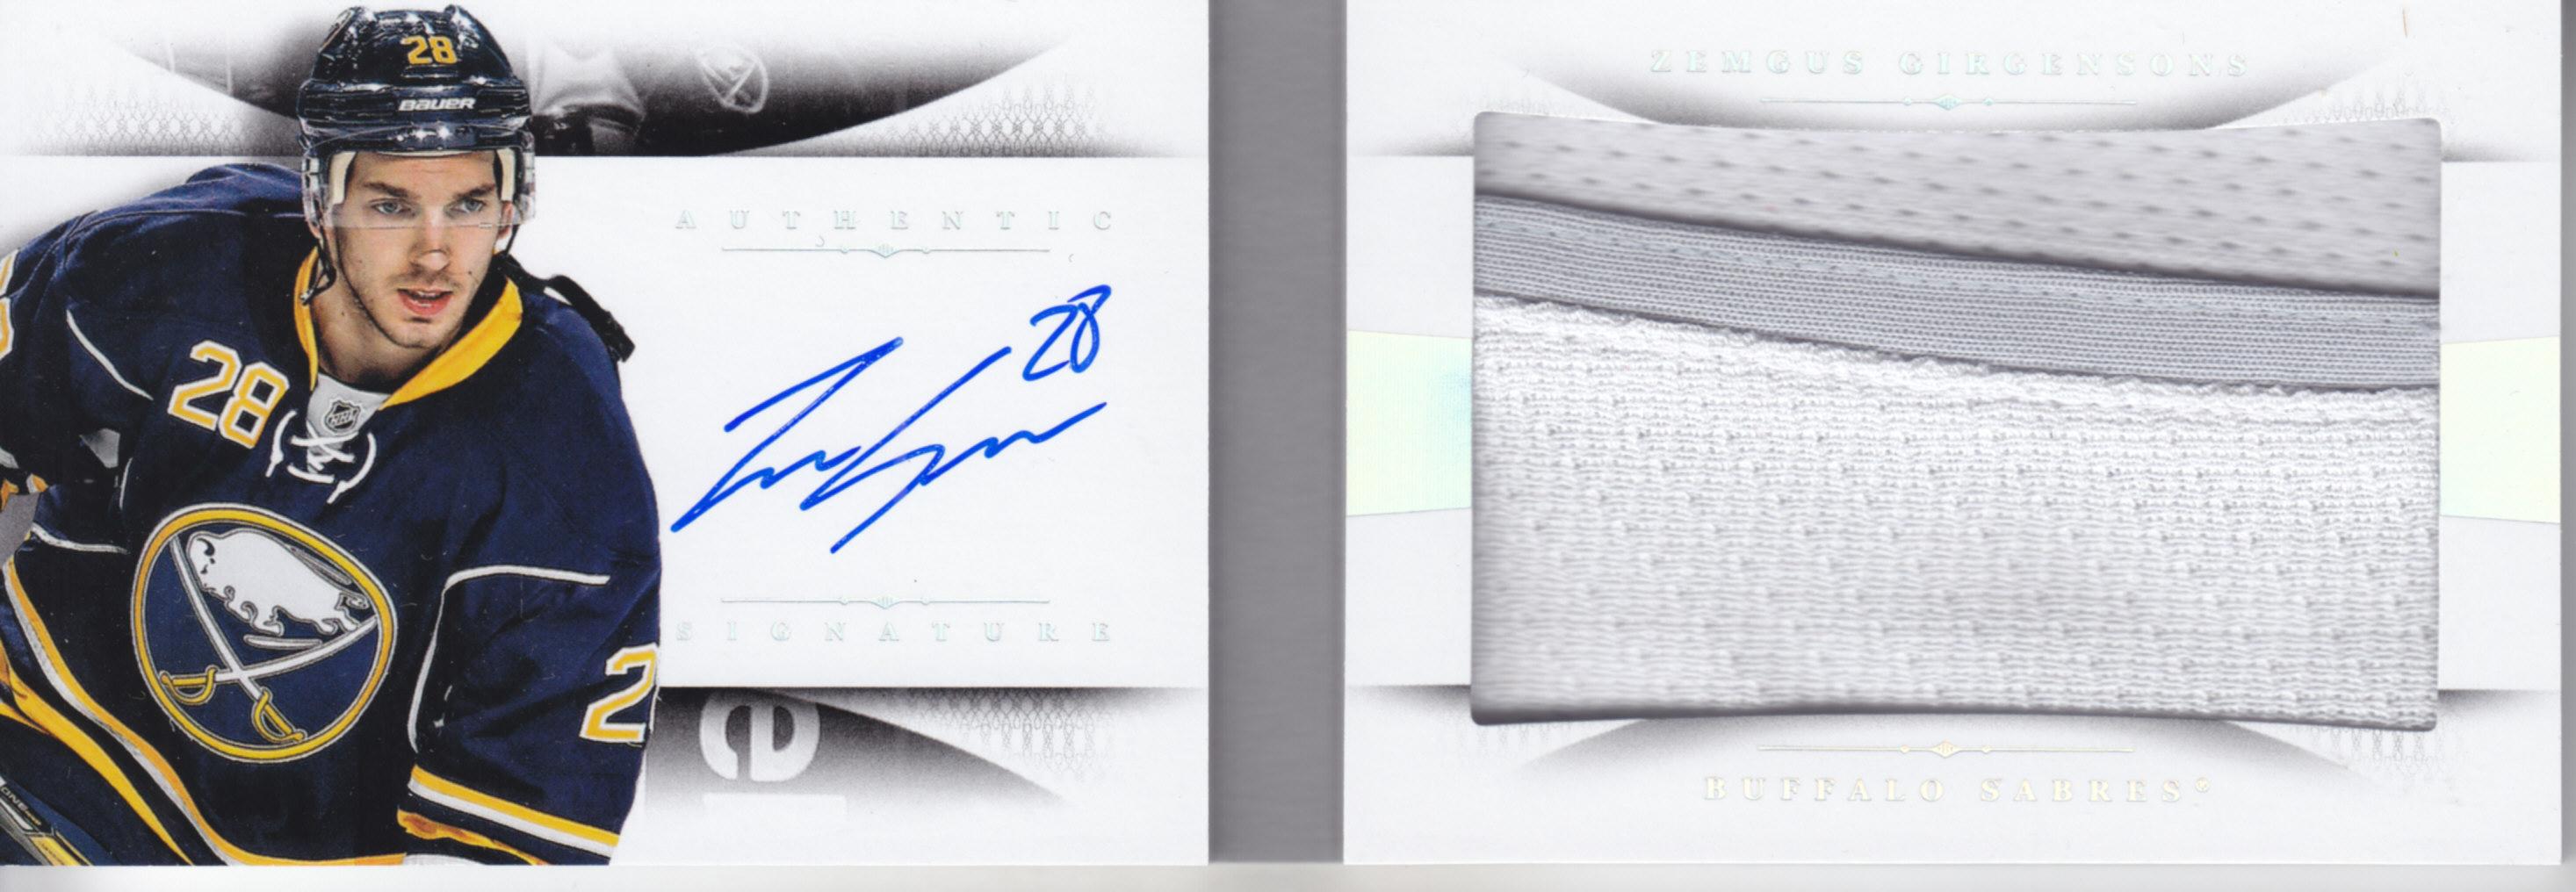 2013-14 Panini National Treasures Rookie Jumbo Jerseys Booklet Autographs Prime #18 Zemgus Girgensons